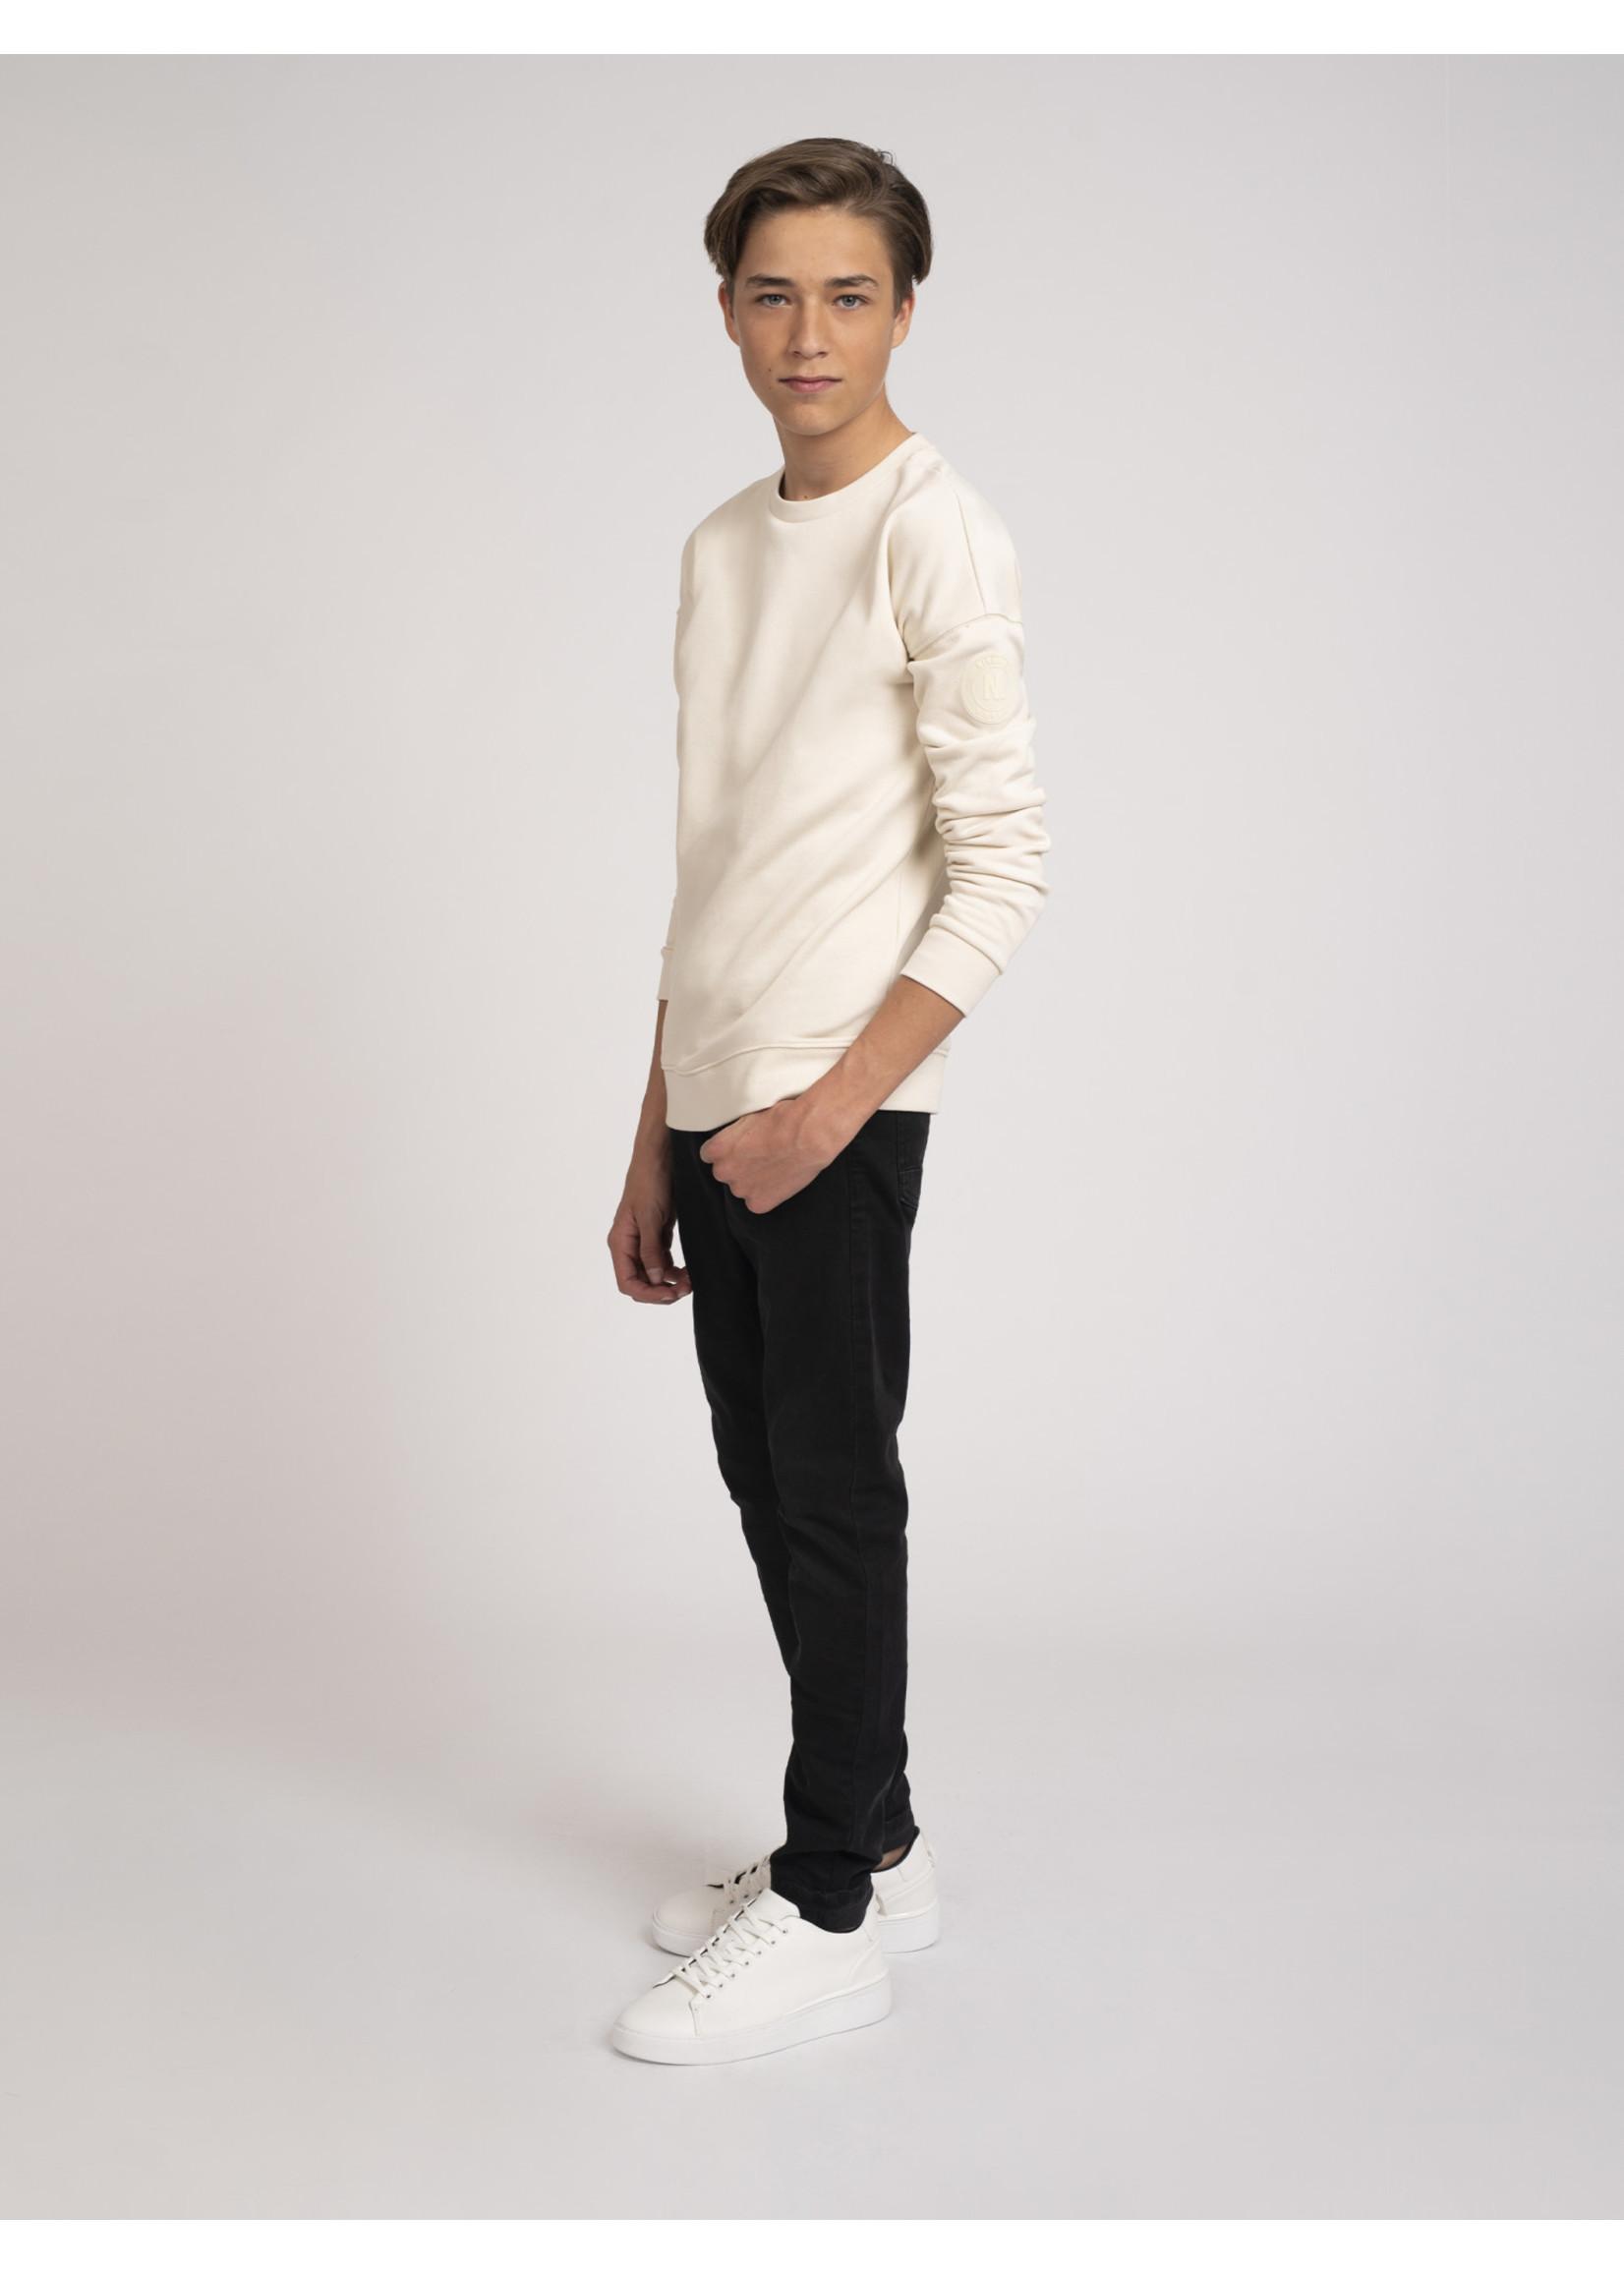 NIK&NIK NIK&NIK Diego Sweater - Dusty White